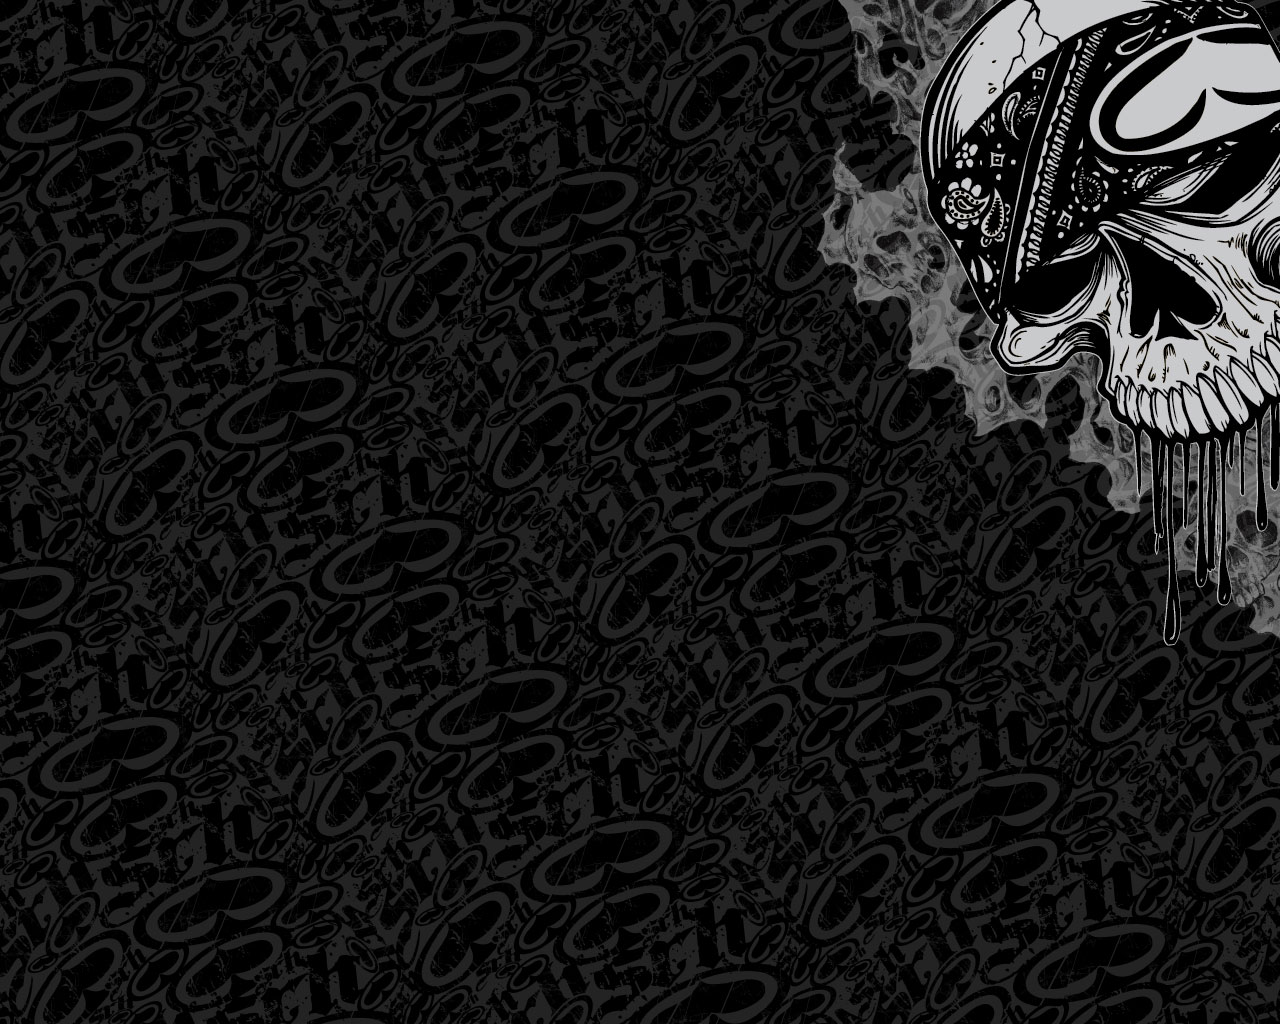 Metal Mulisha wallpaper   1280x1024   #69403